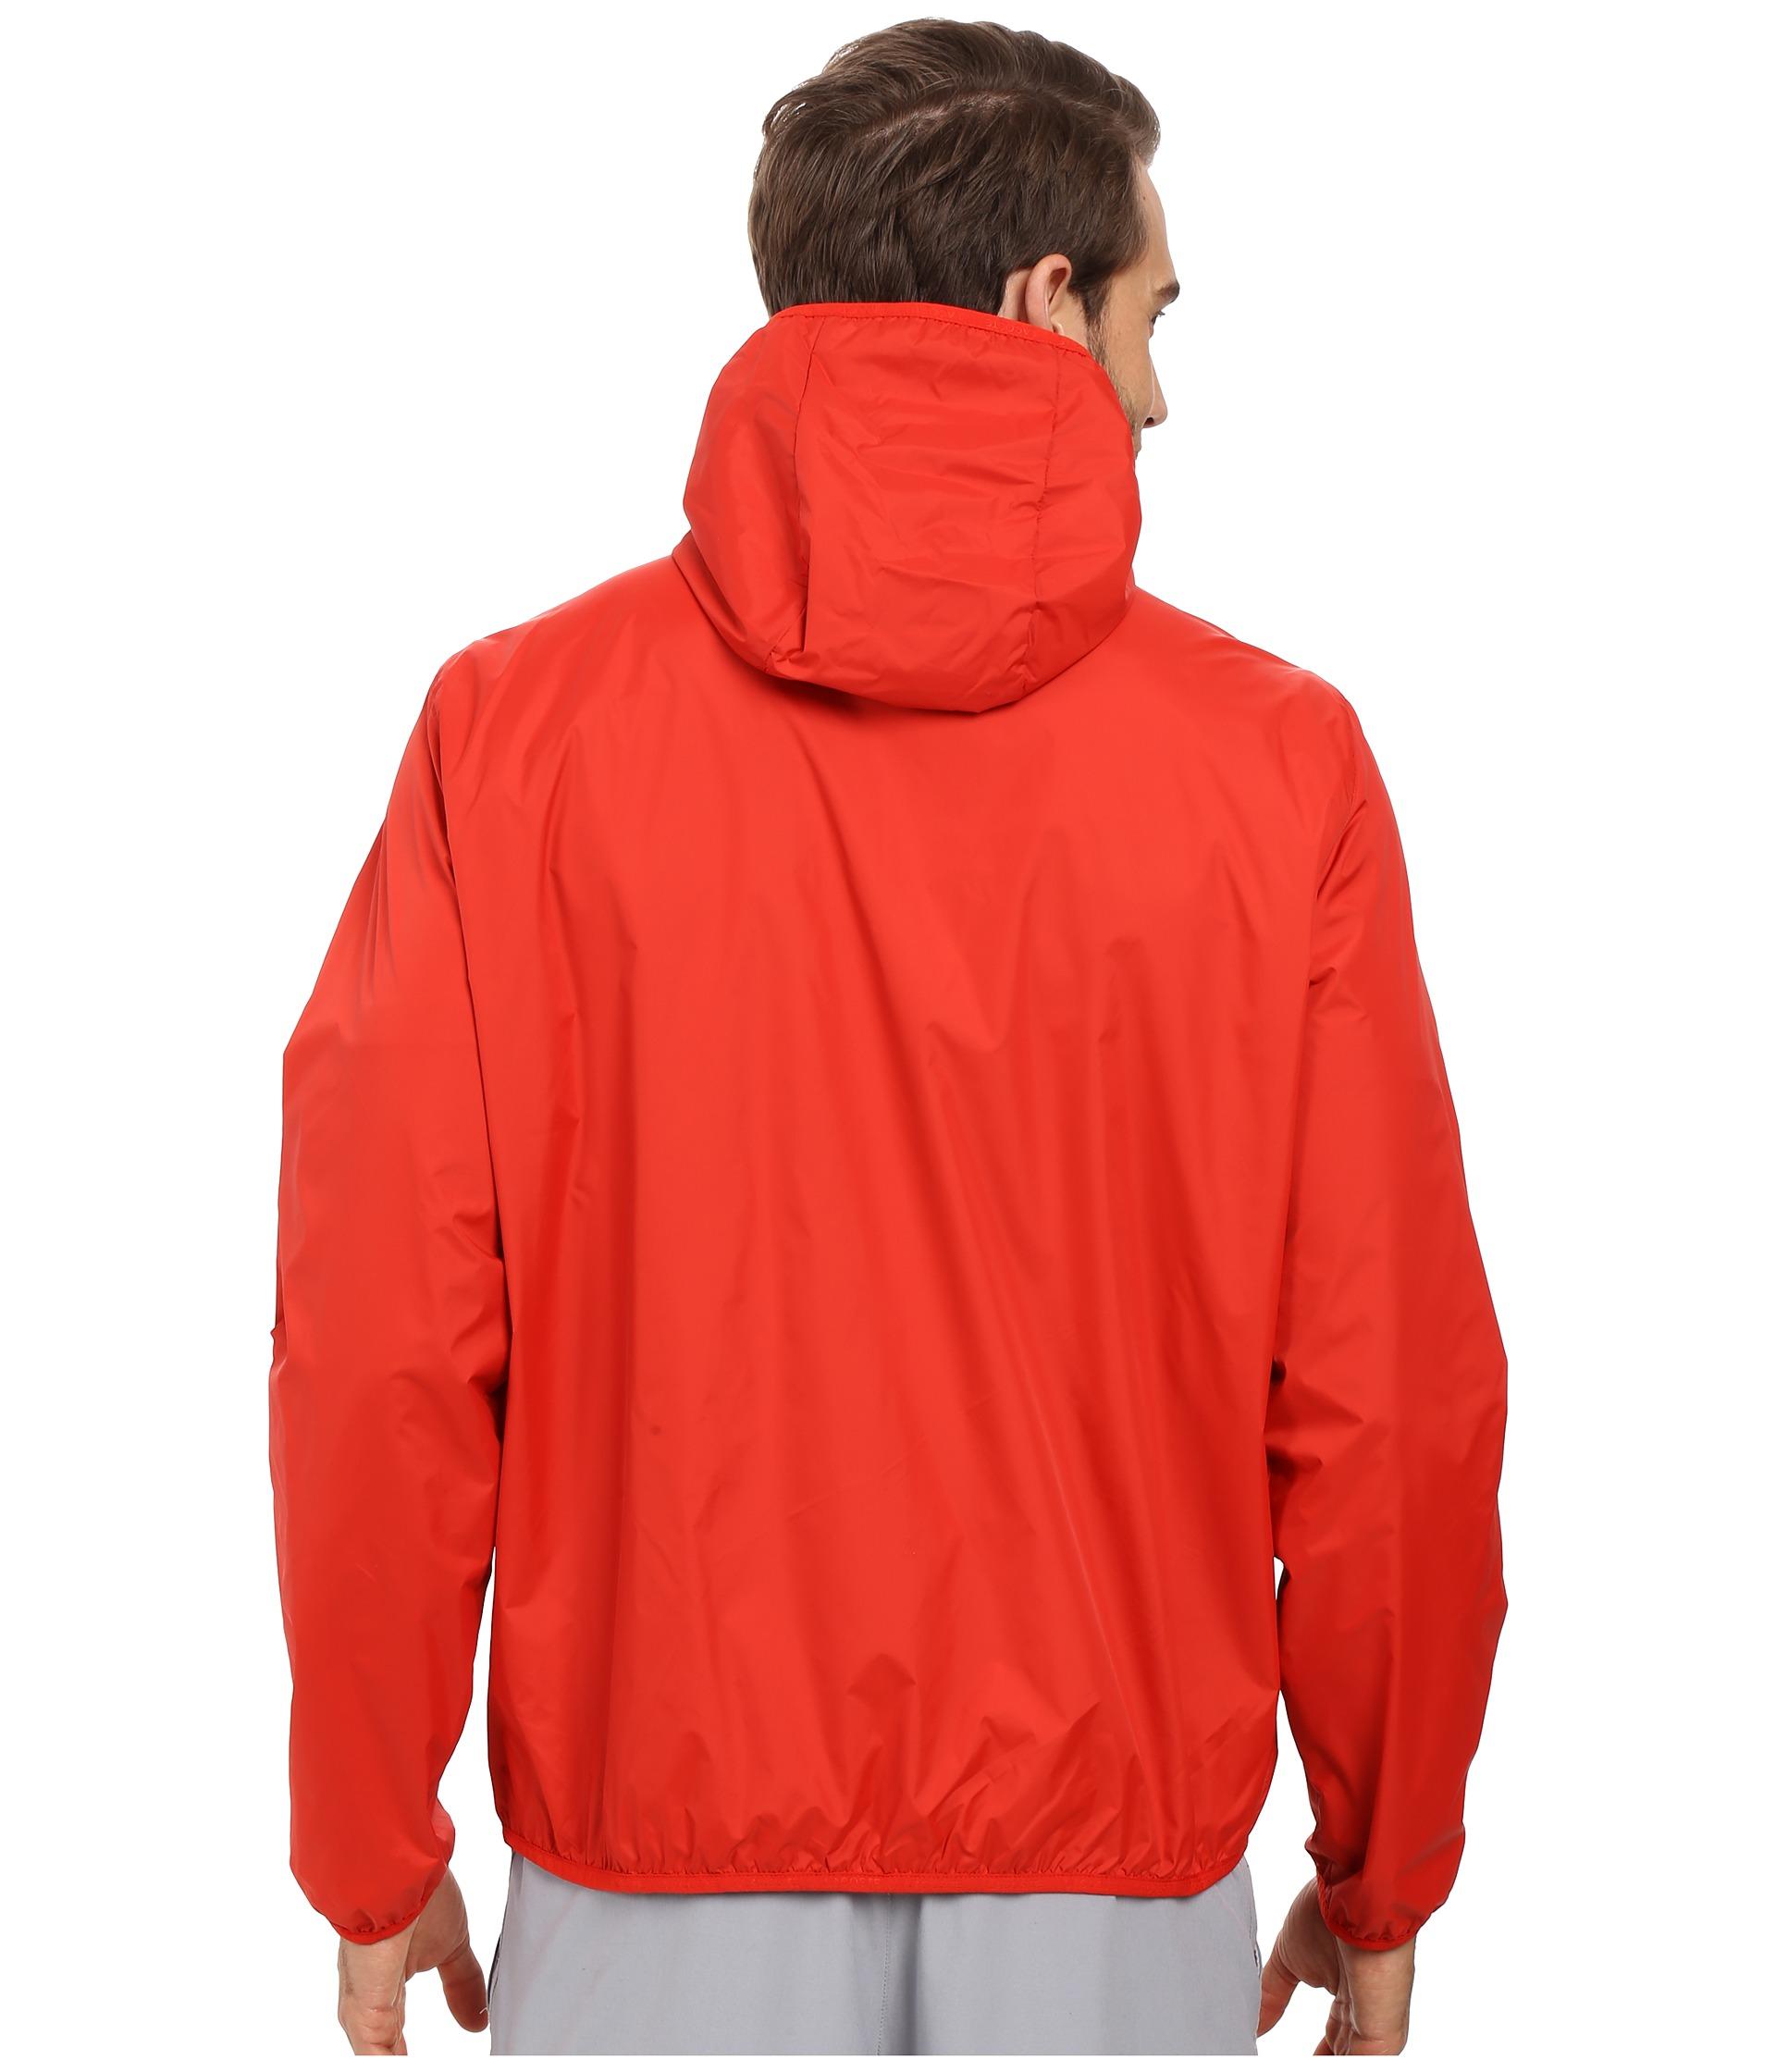 lacoste sport taffeta jacket matador red free. Black Bedroom Furniture Sets. Home Design Ideas